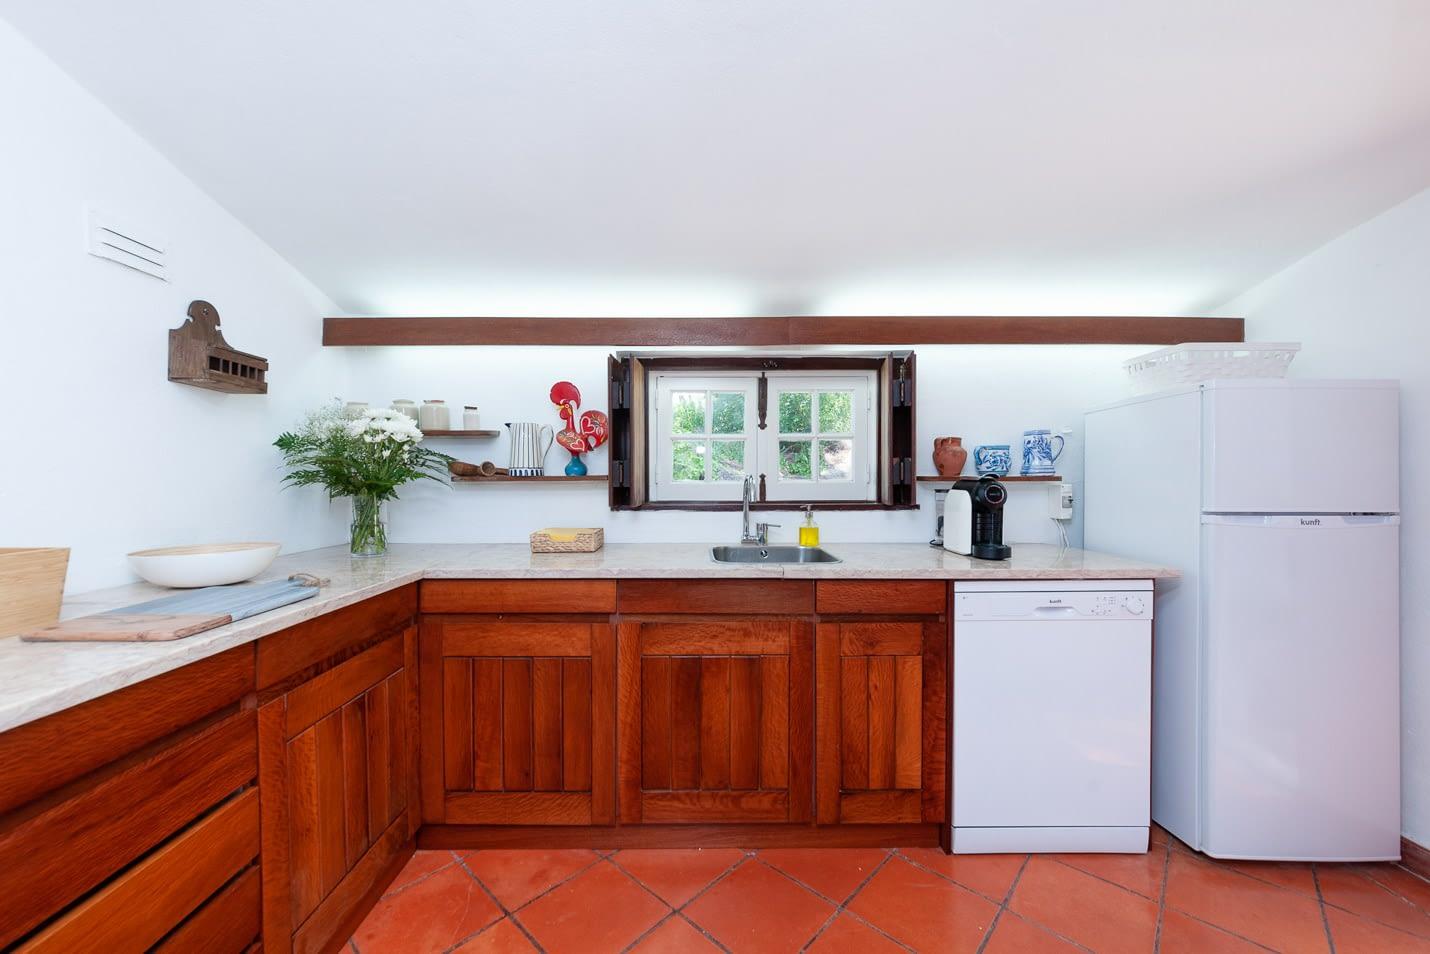 Pine tree house kitchen